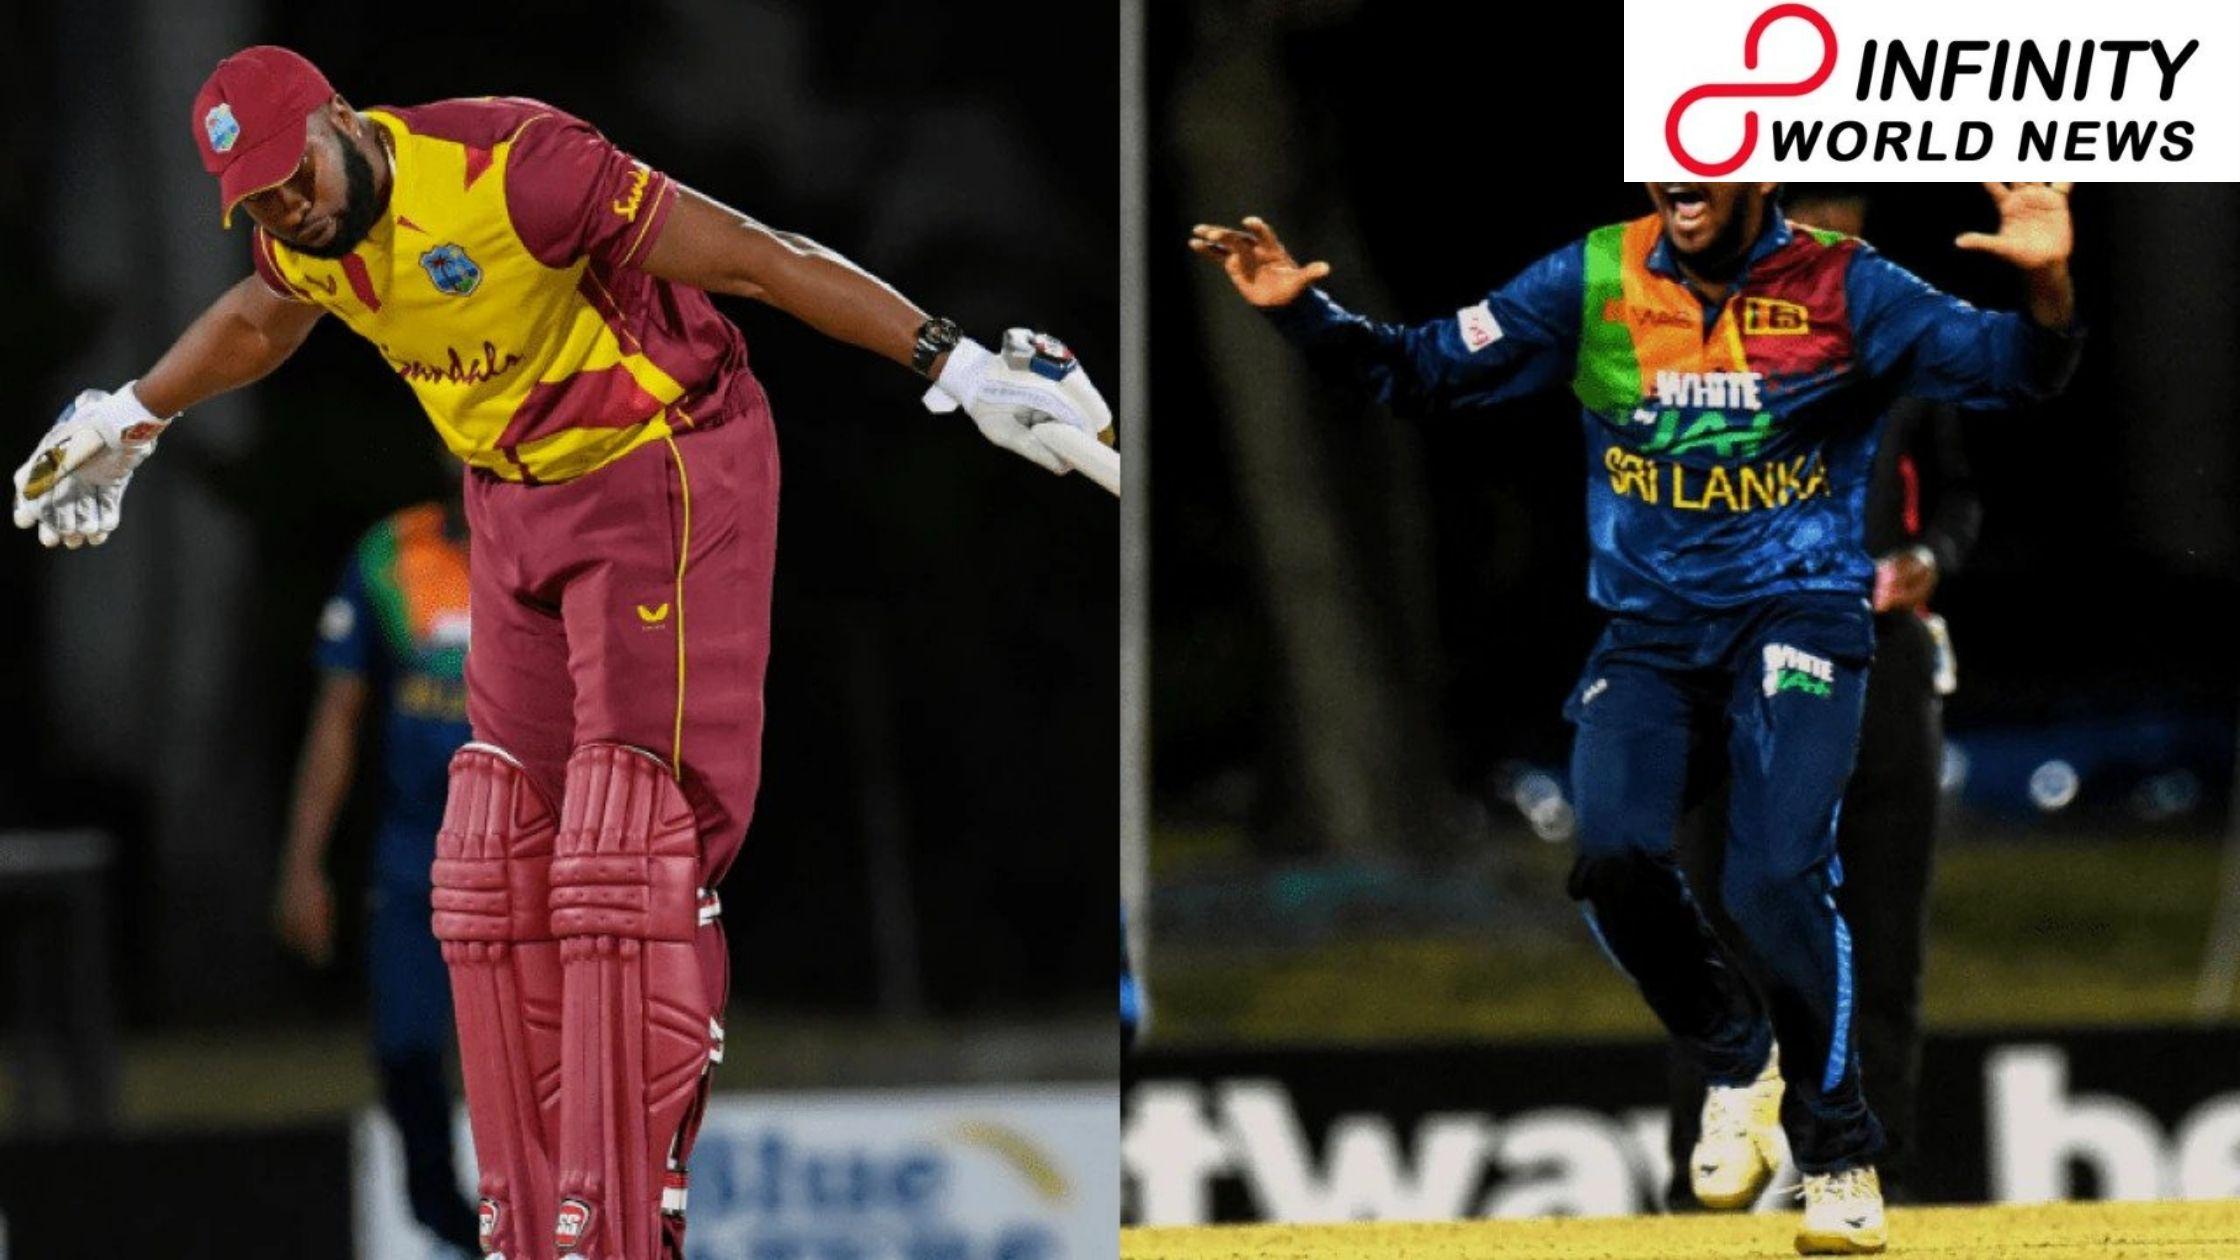 Sri Lanka pick to bat in ODI arrangement opener; West Indies hold Akeal Hosein